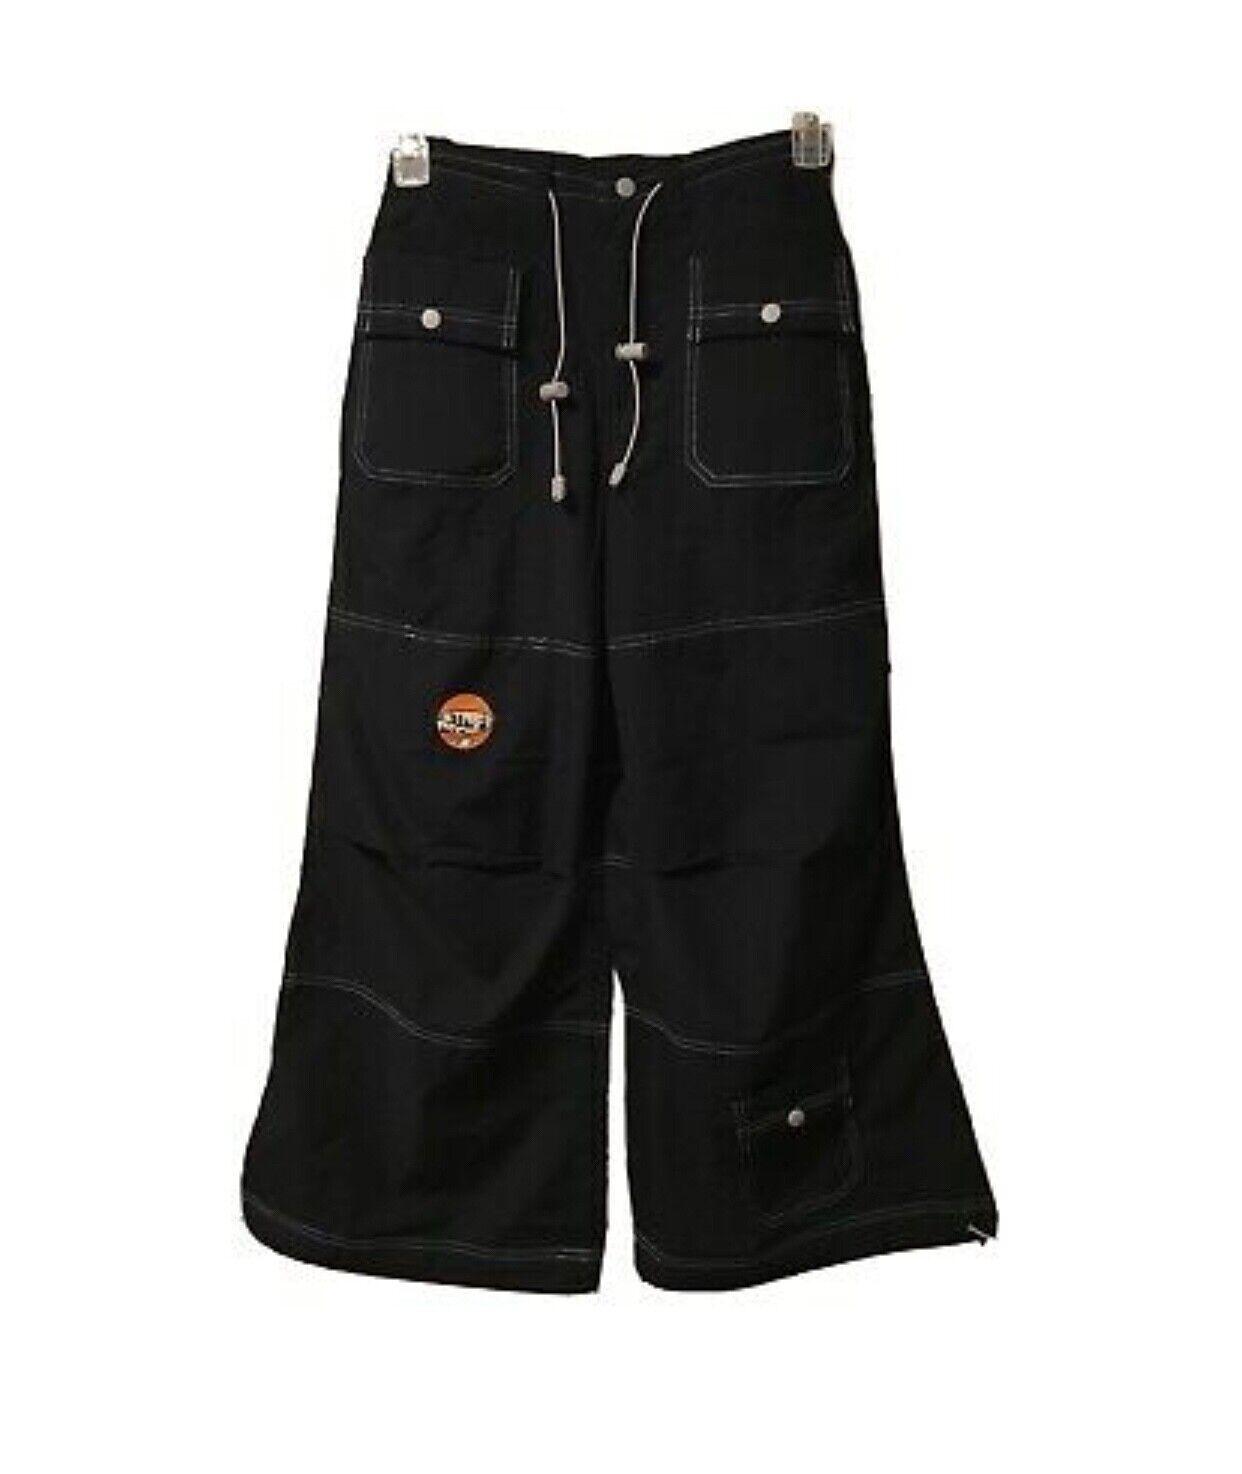 Macgirl Women's Pants Mac Raver Gear Navy Blue Wide leg NWT